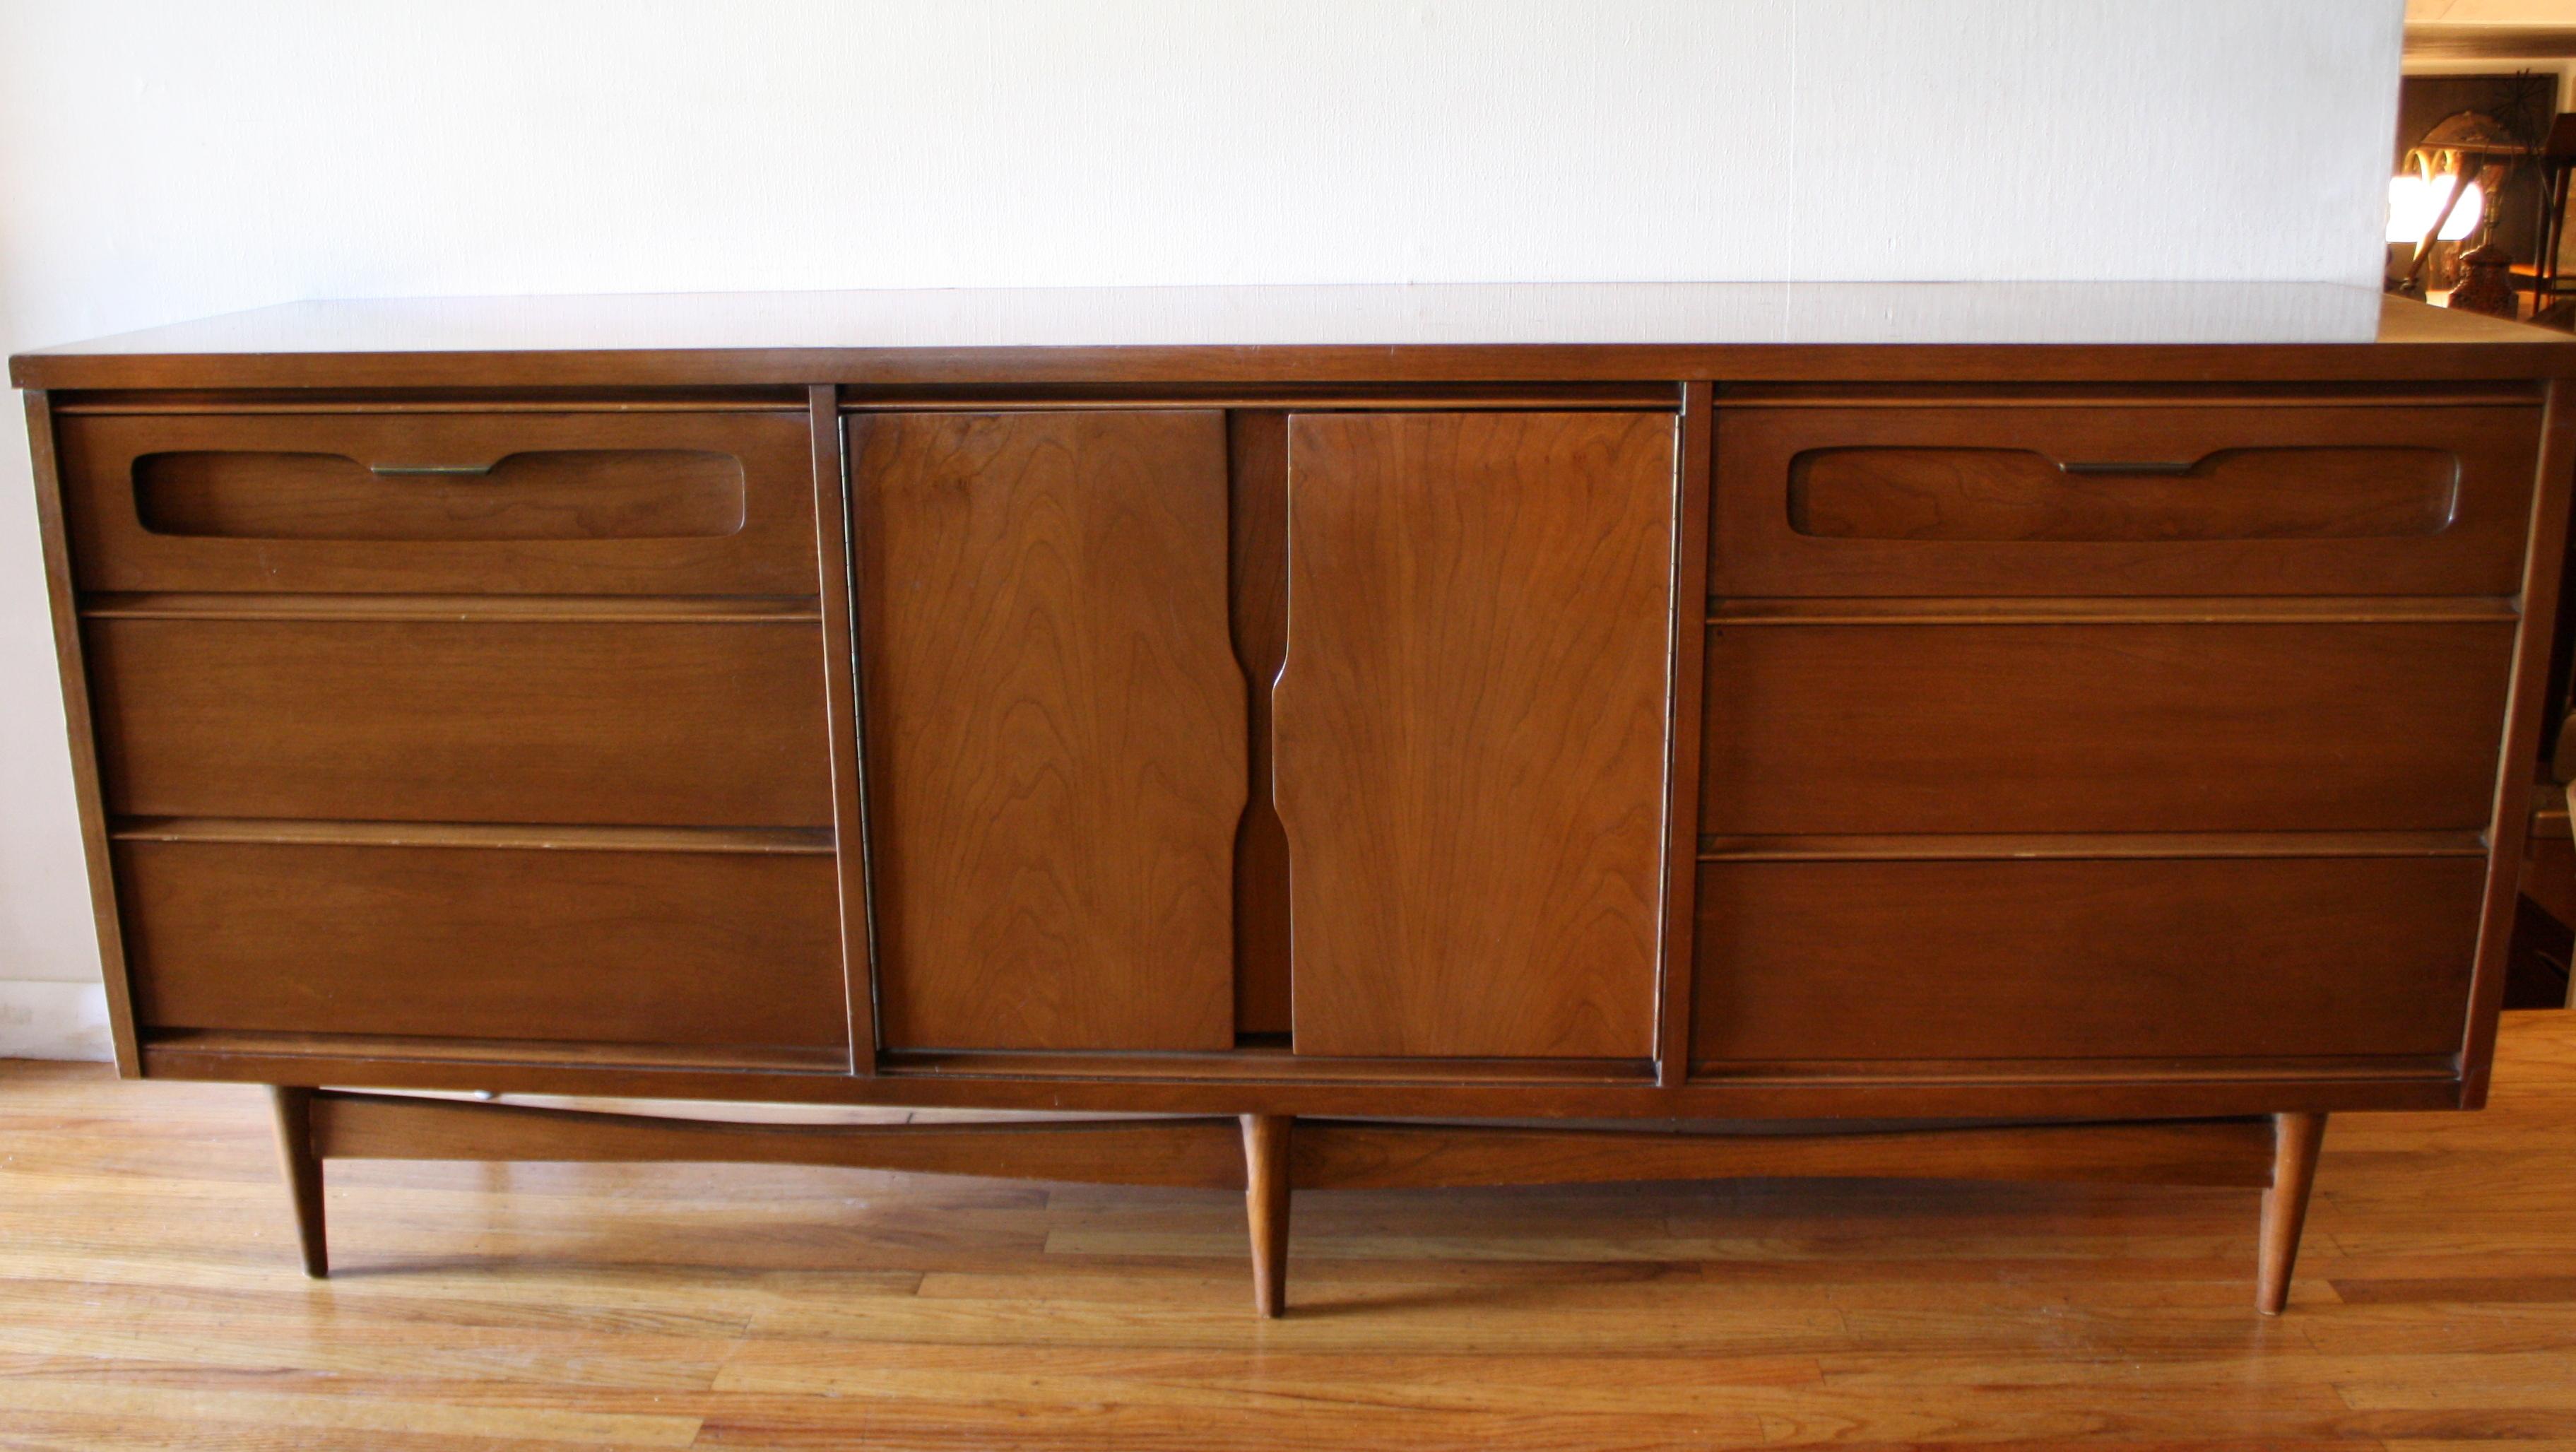 Replacement Pulls For Furniture Thomasville Furniture Drawer Handles  ... Sligh Furniture Dresser. on drexel bedroom furniture drawer pulls